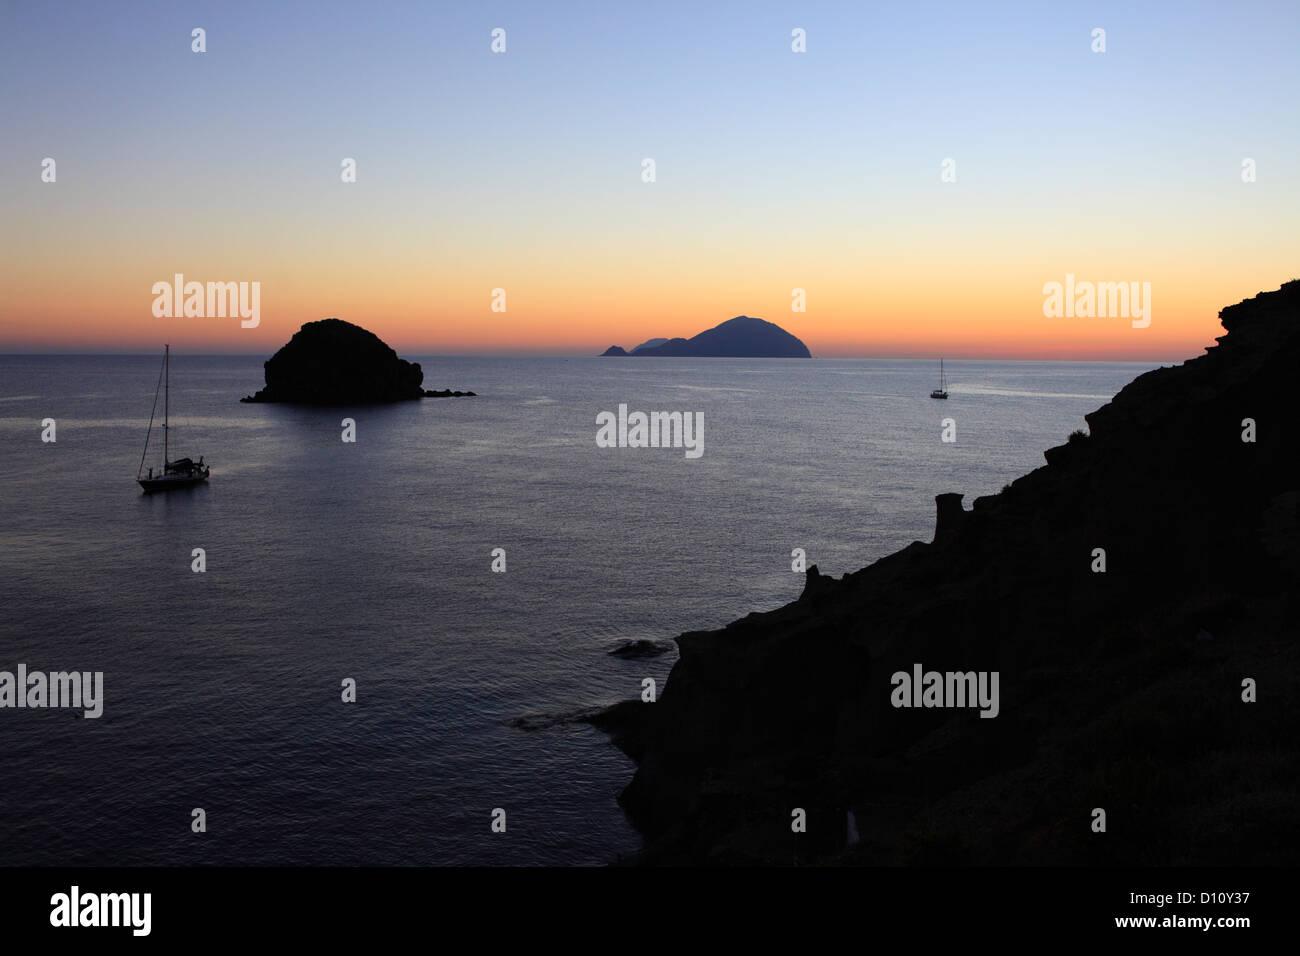 Faraglione rocks and Filicudi island seen from Pollara, Salina, Aeolian islands, Sicily, Italy Stock Photo